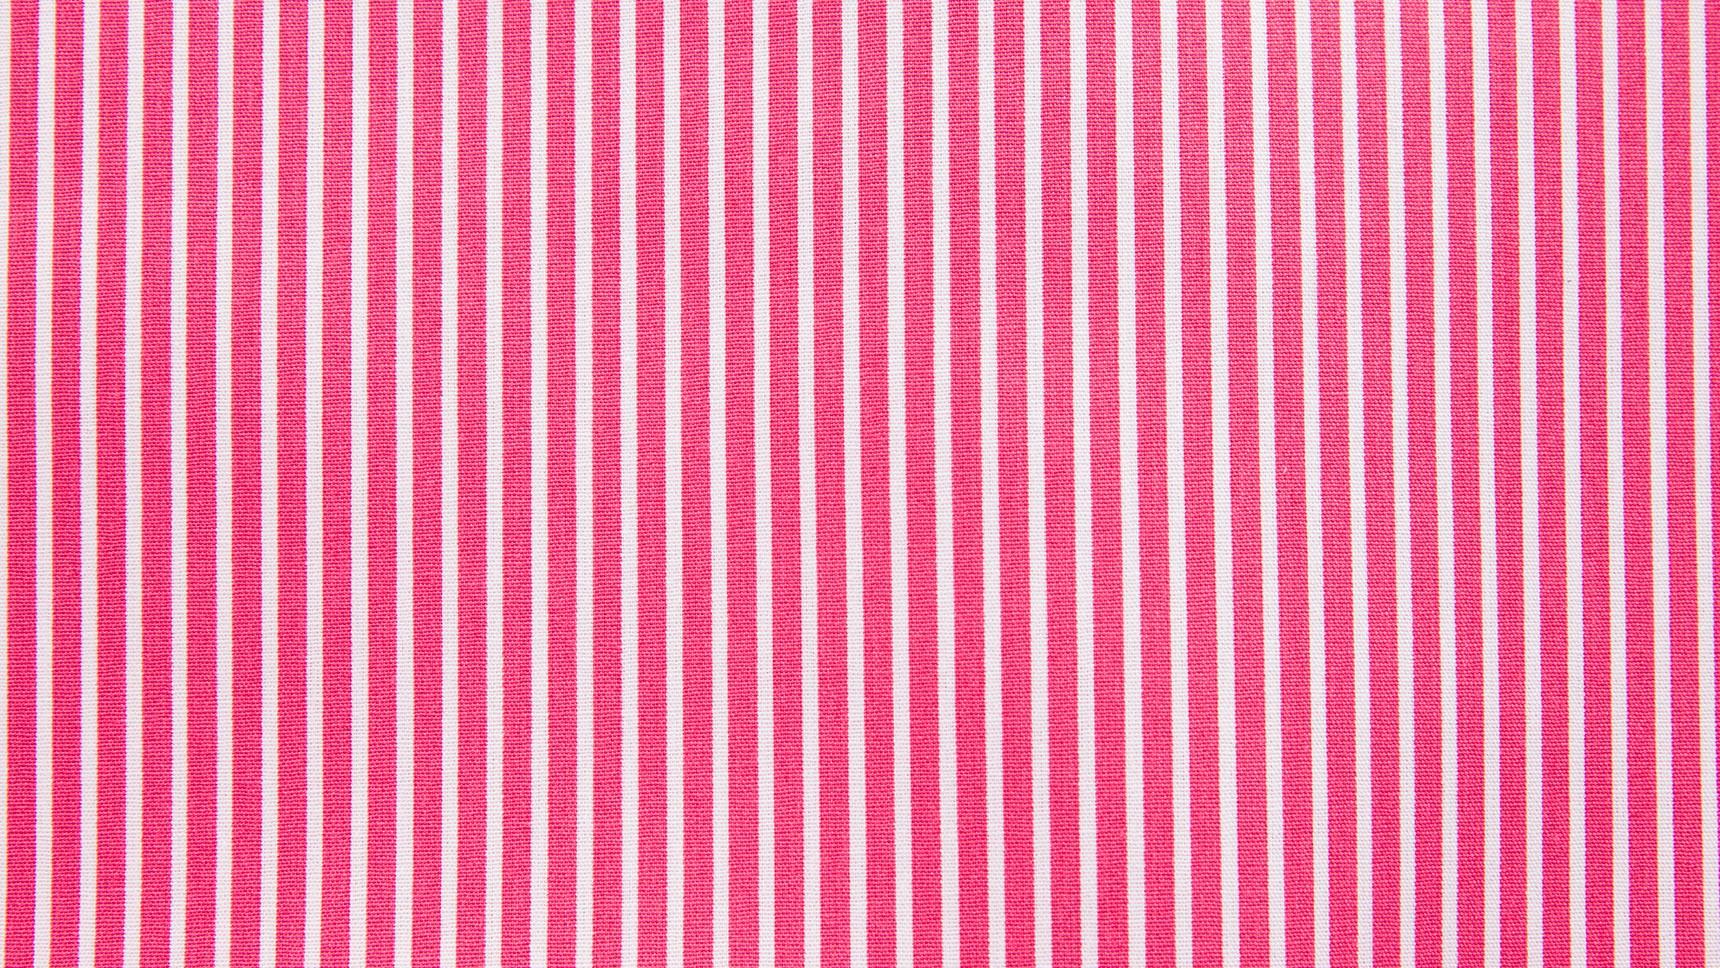 Riscas - Branco - Rosa